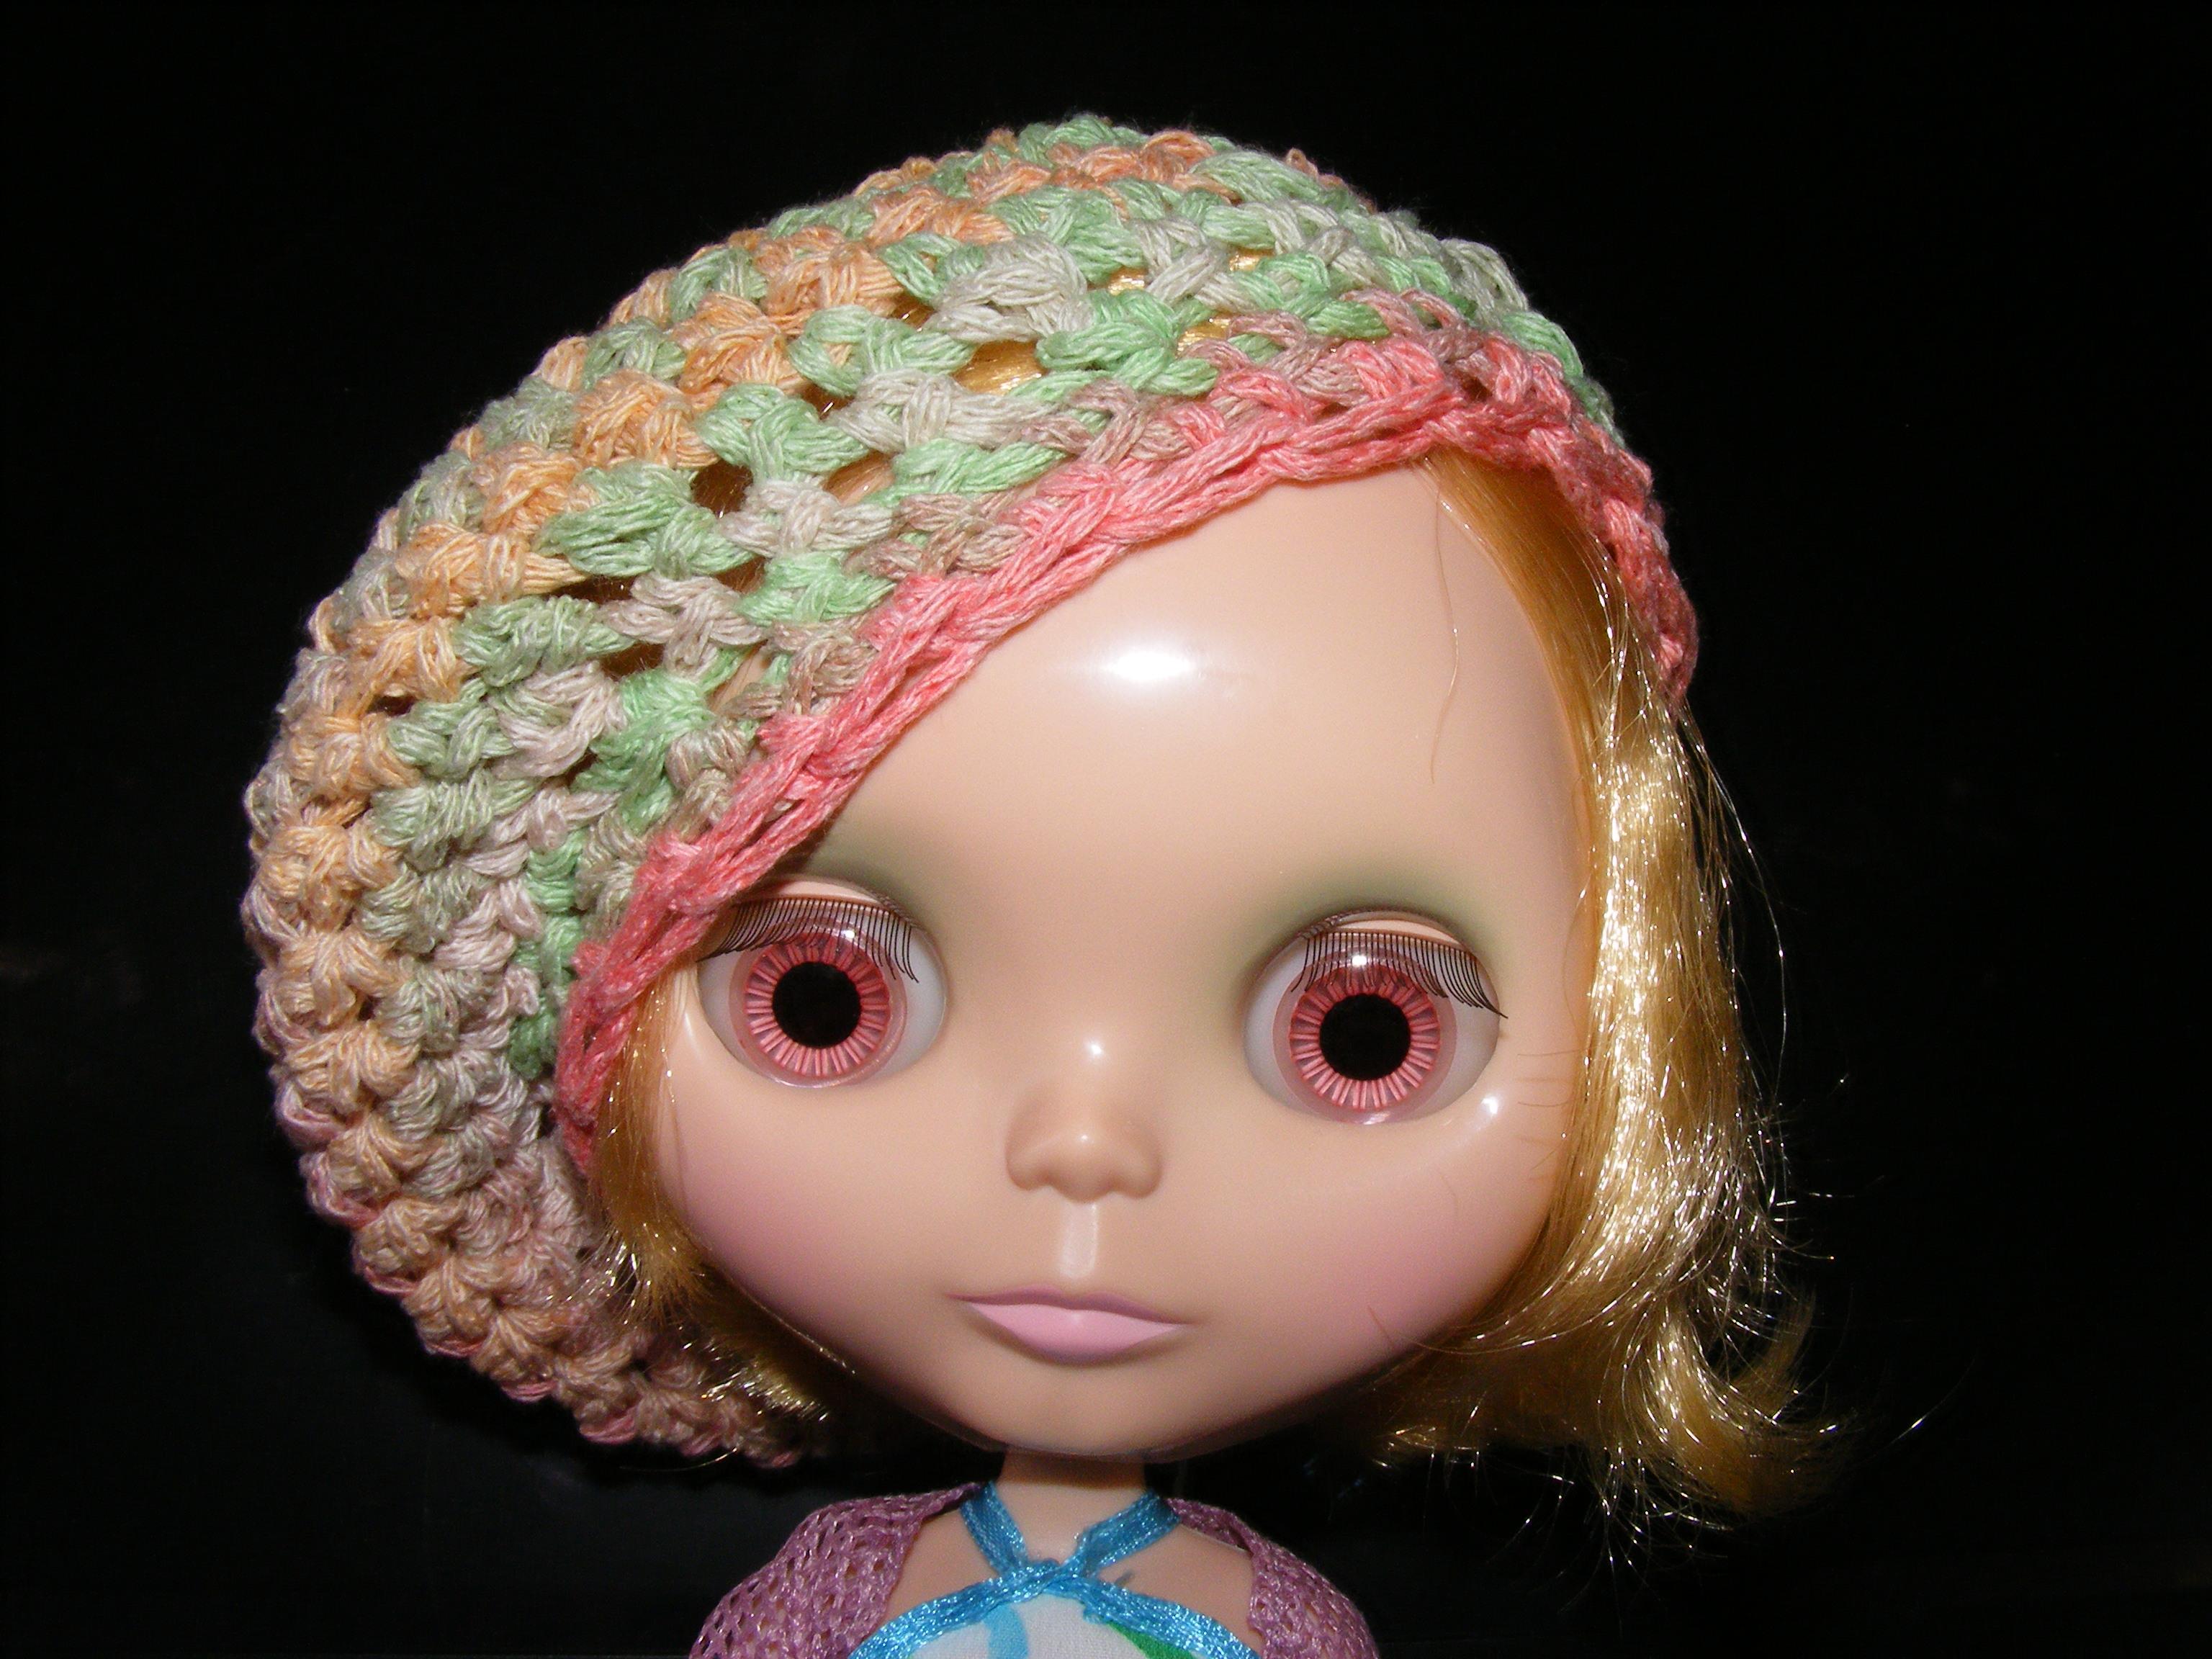 Crochet Hat Pattern For Blythe : Freebie Friday! Blythe Crocheted Hat